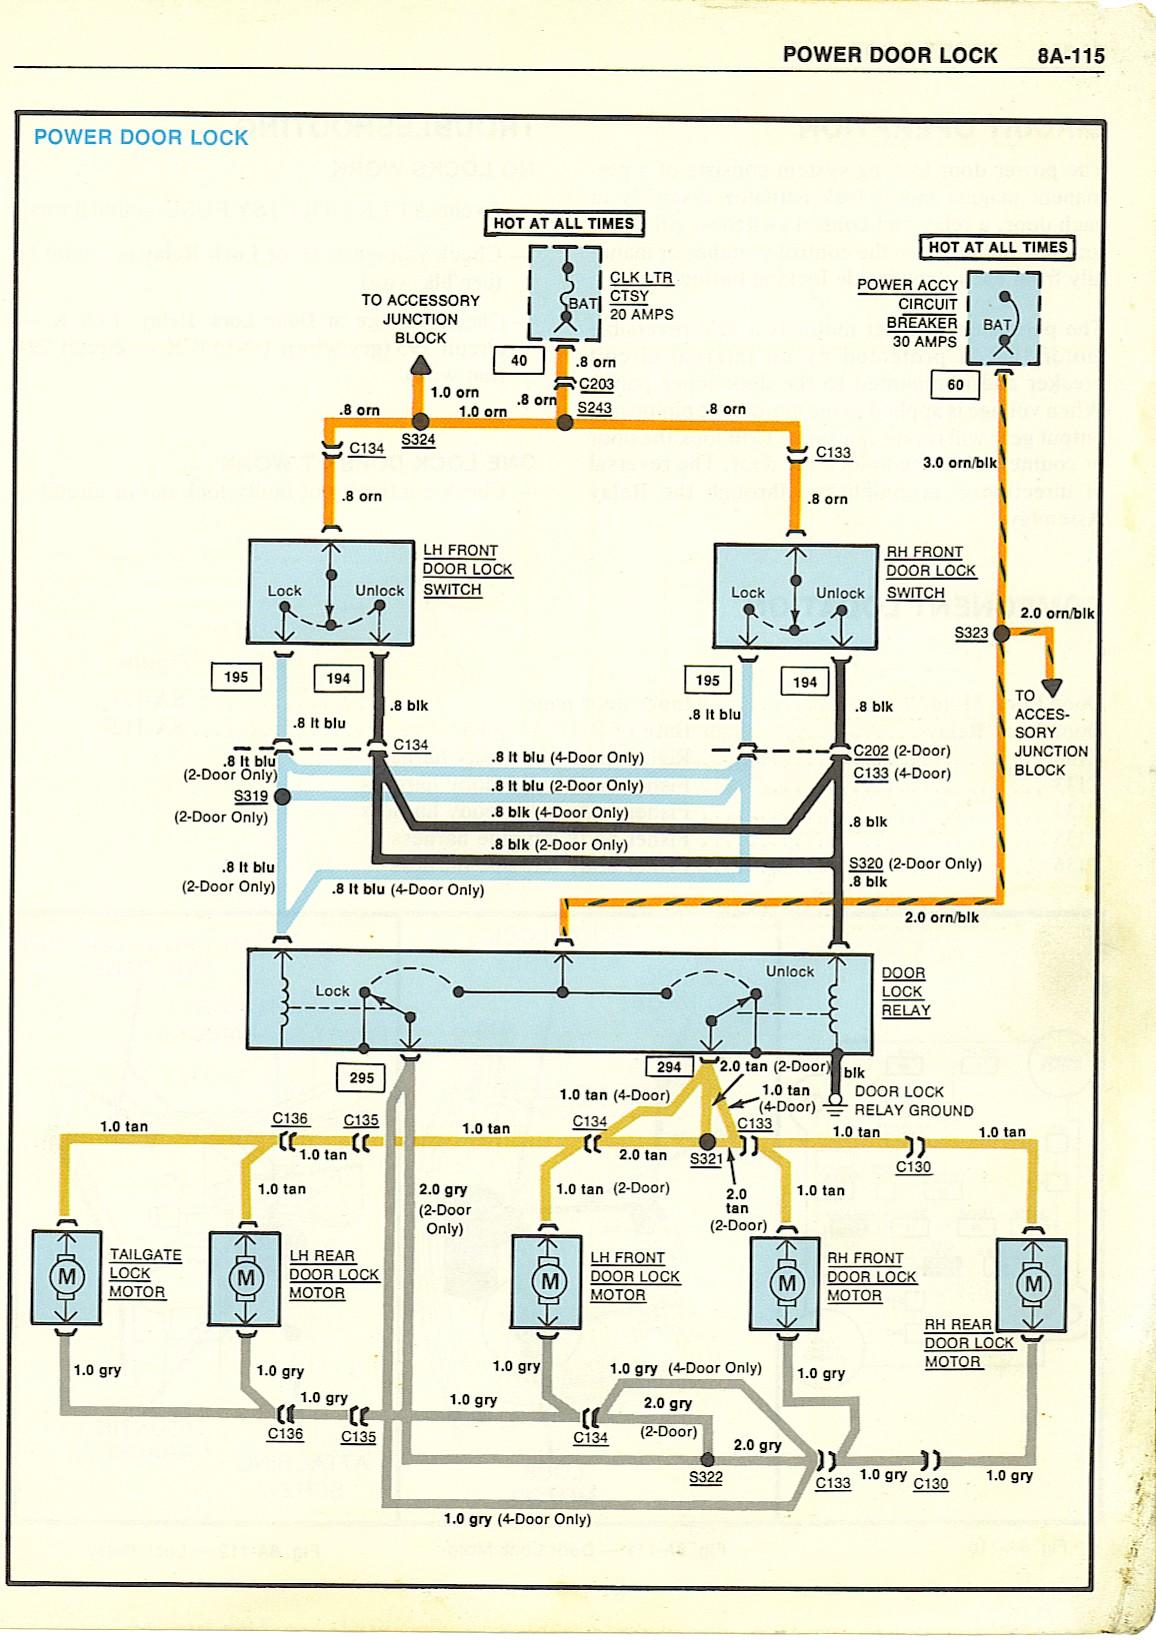 Gm Door Lock Switch Wiring Diagram | Wiring Diagram - Power Door Lock Wiring Diagram